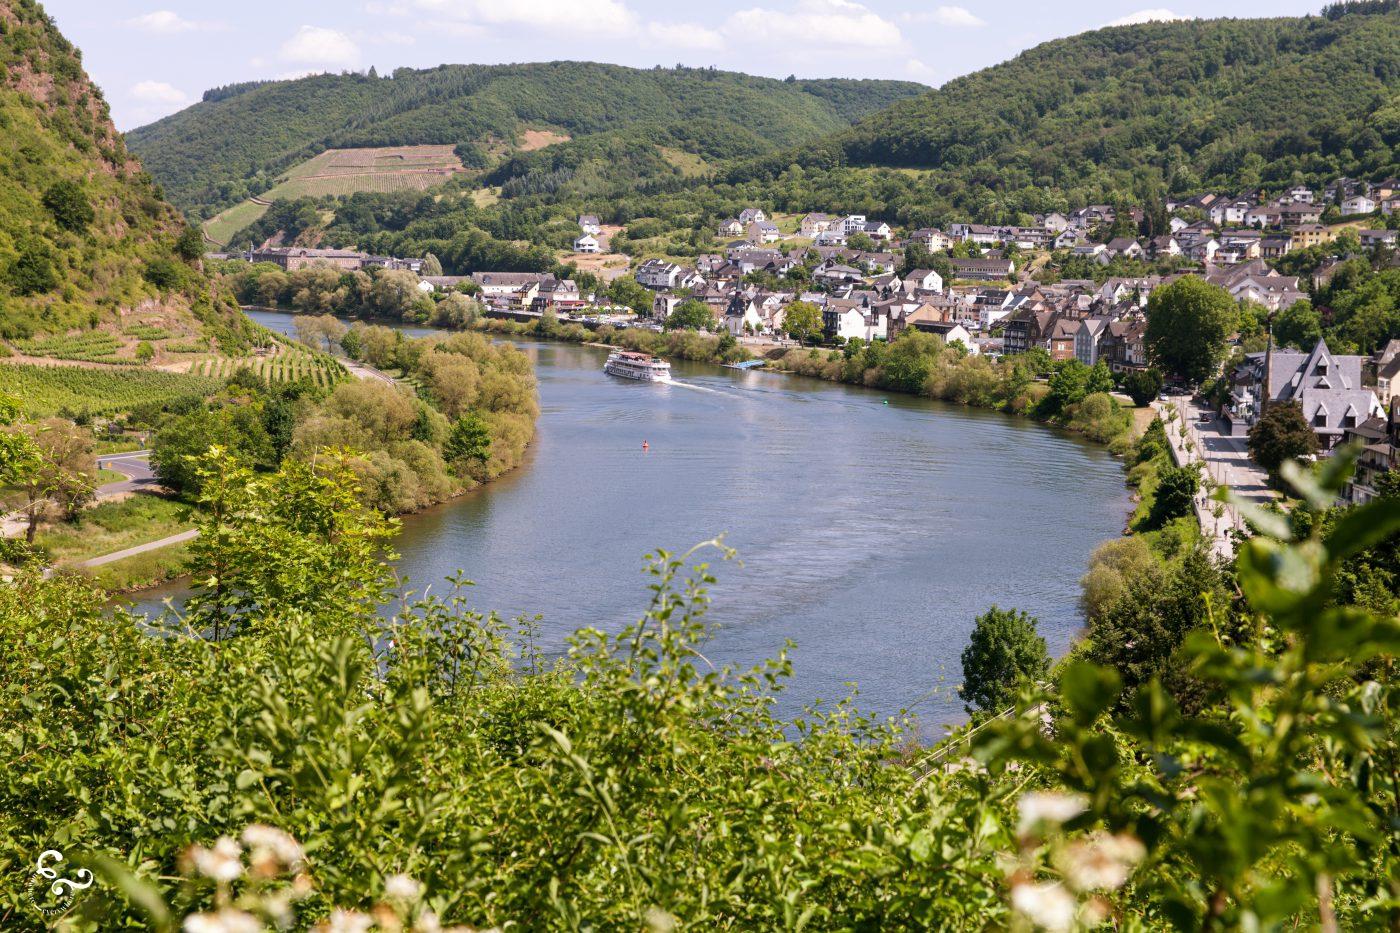 Cochem Moselle River Germany Deutschland Nowhere & Everywhere Lis Dingjan Free Range Pixels Travel Photography Sustainability Environmentalism Instagram